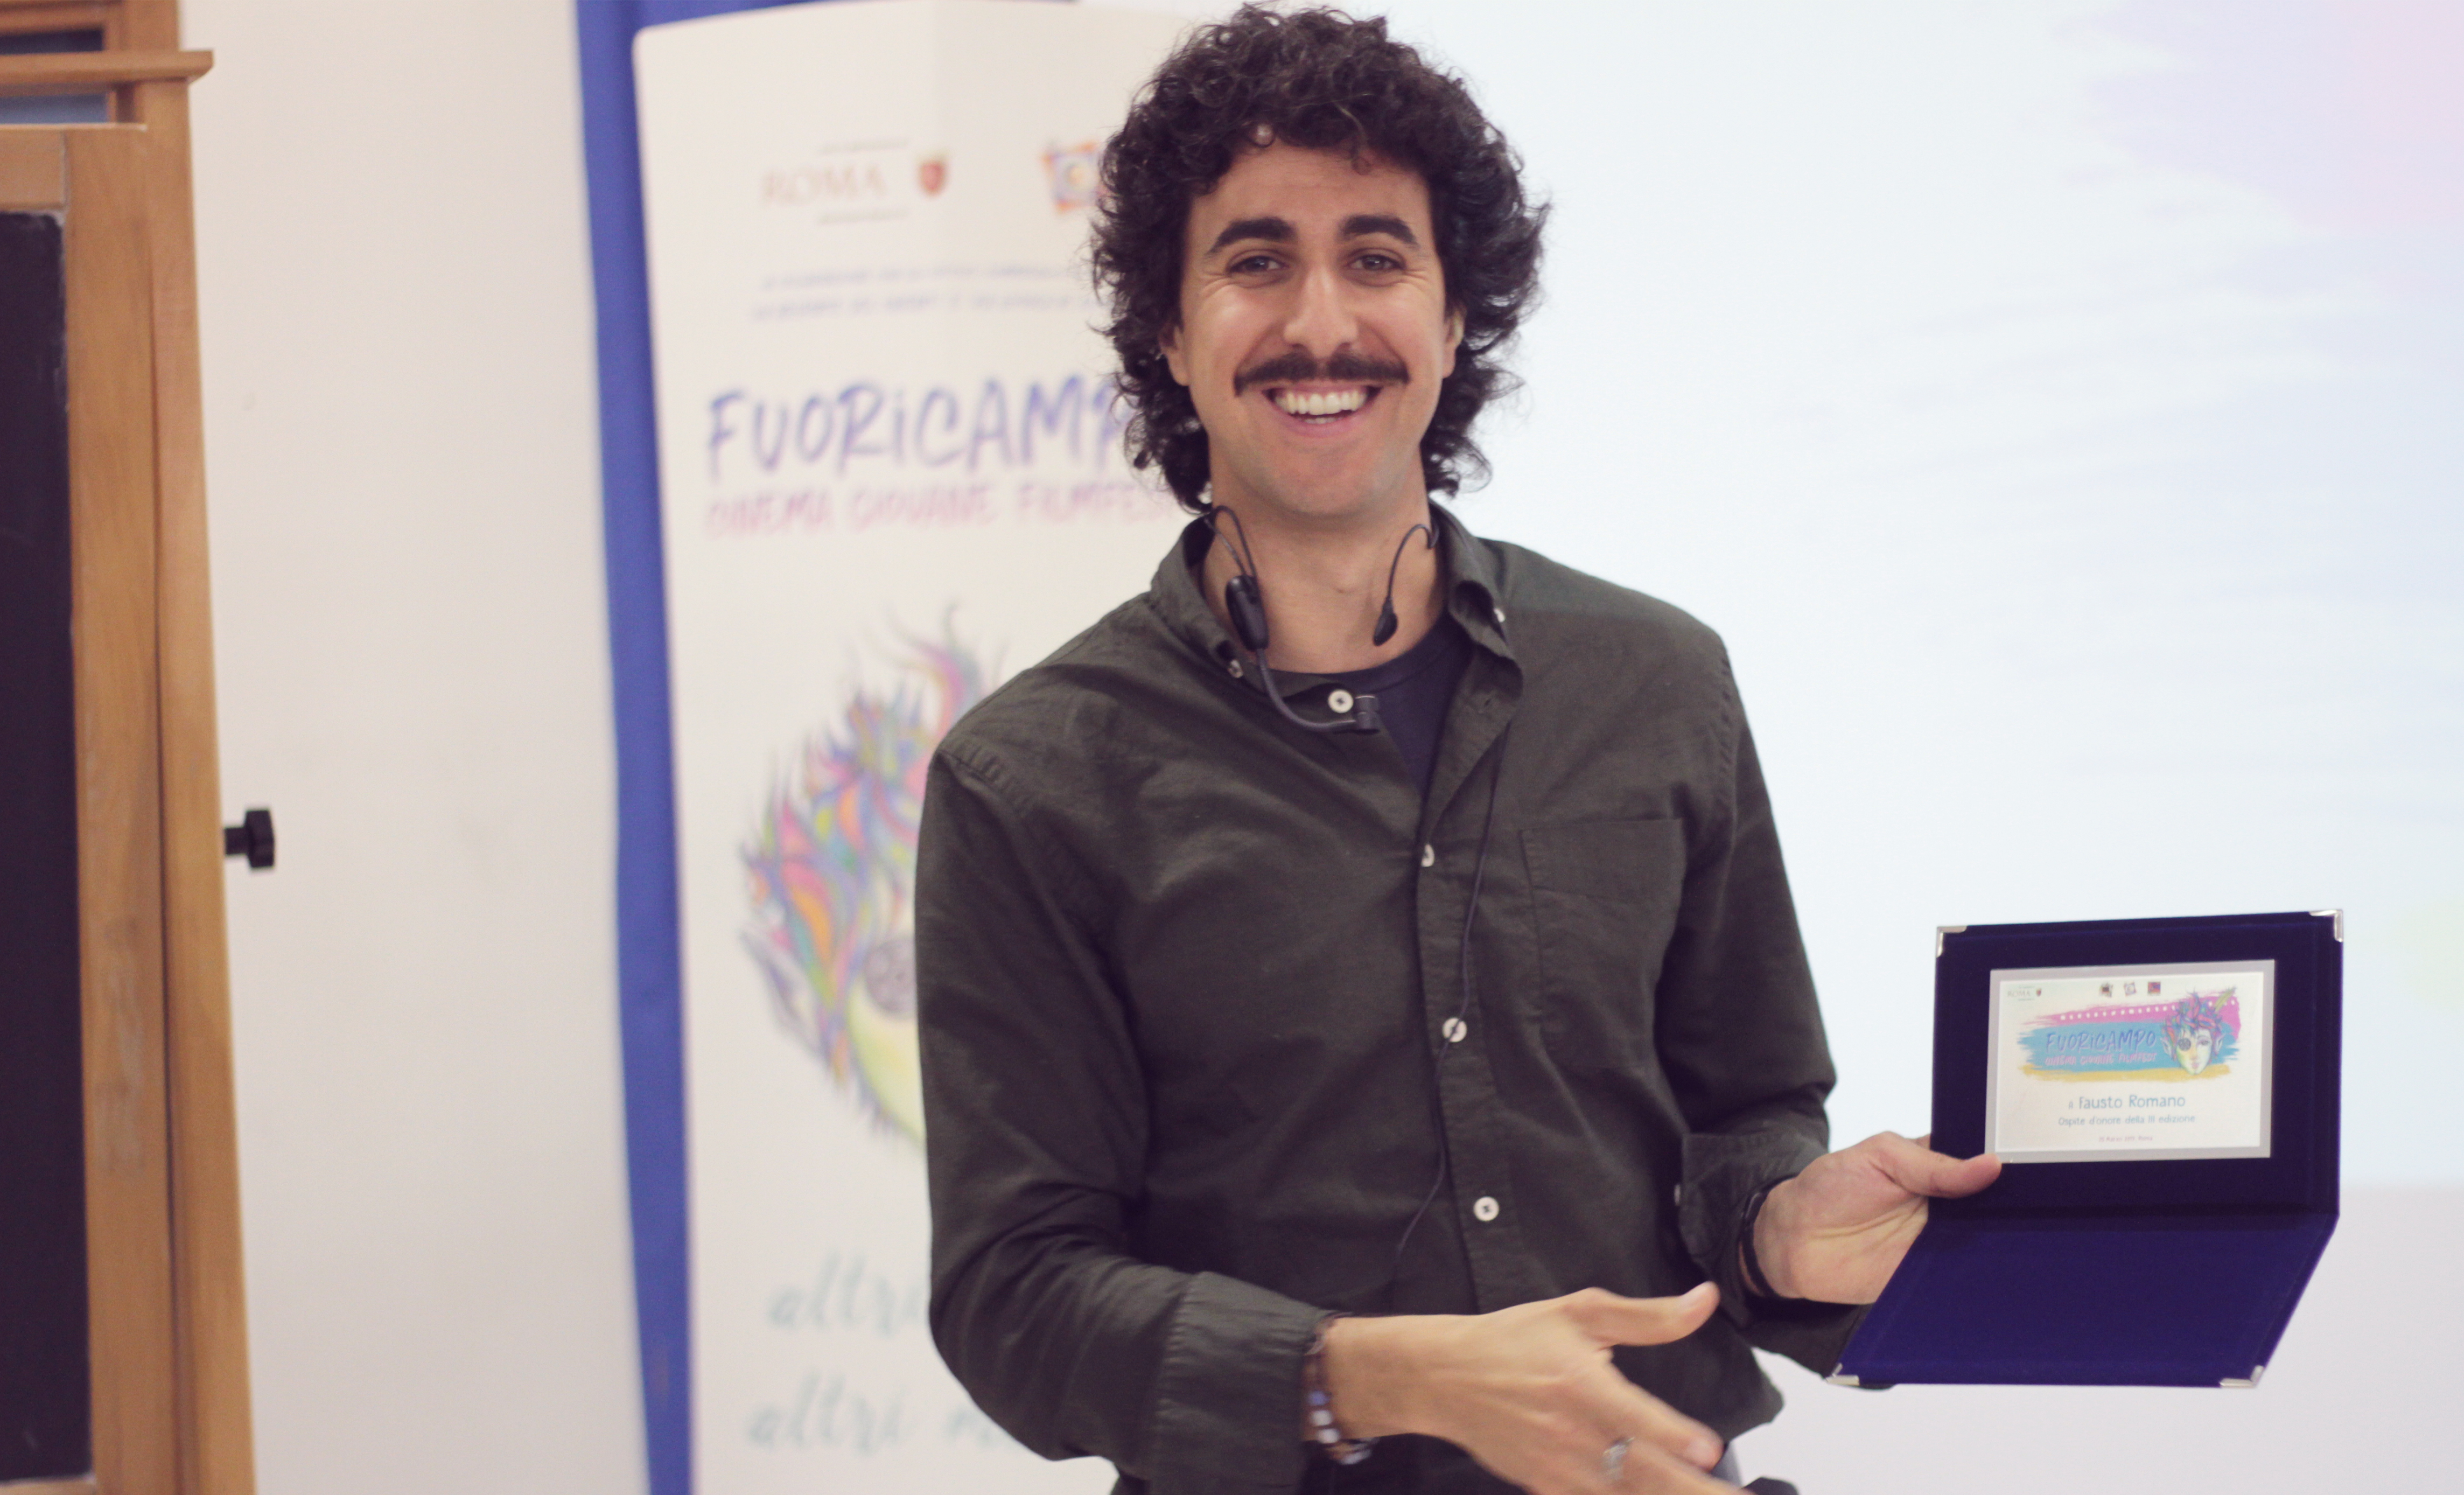 Fausto Romano